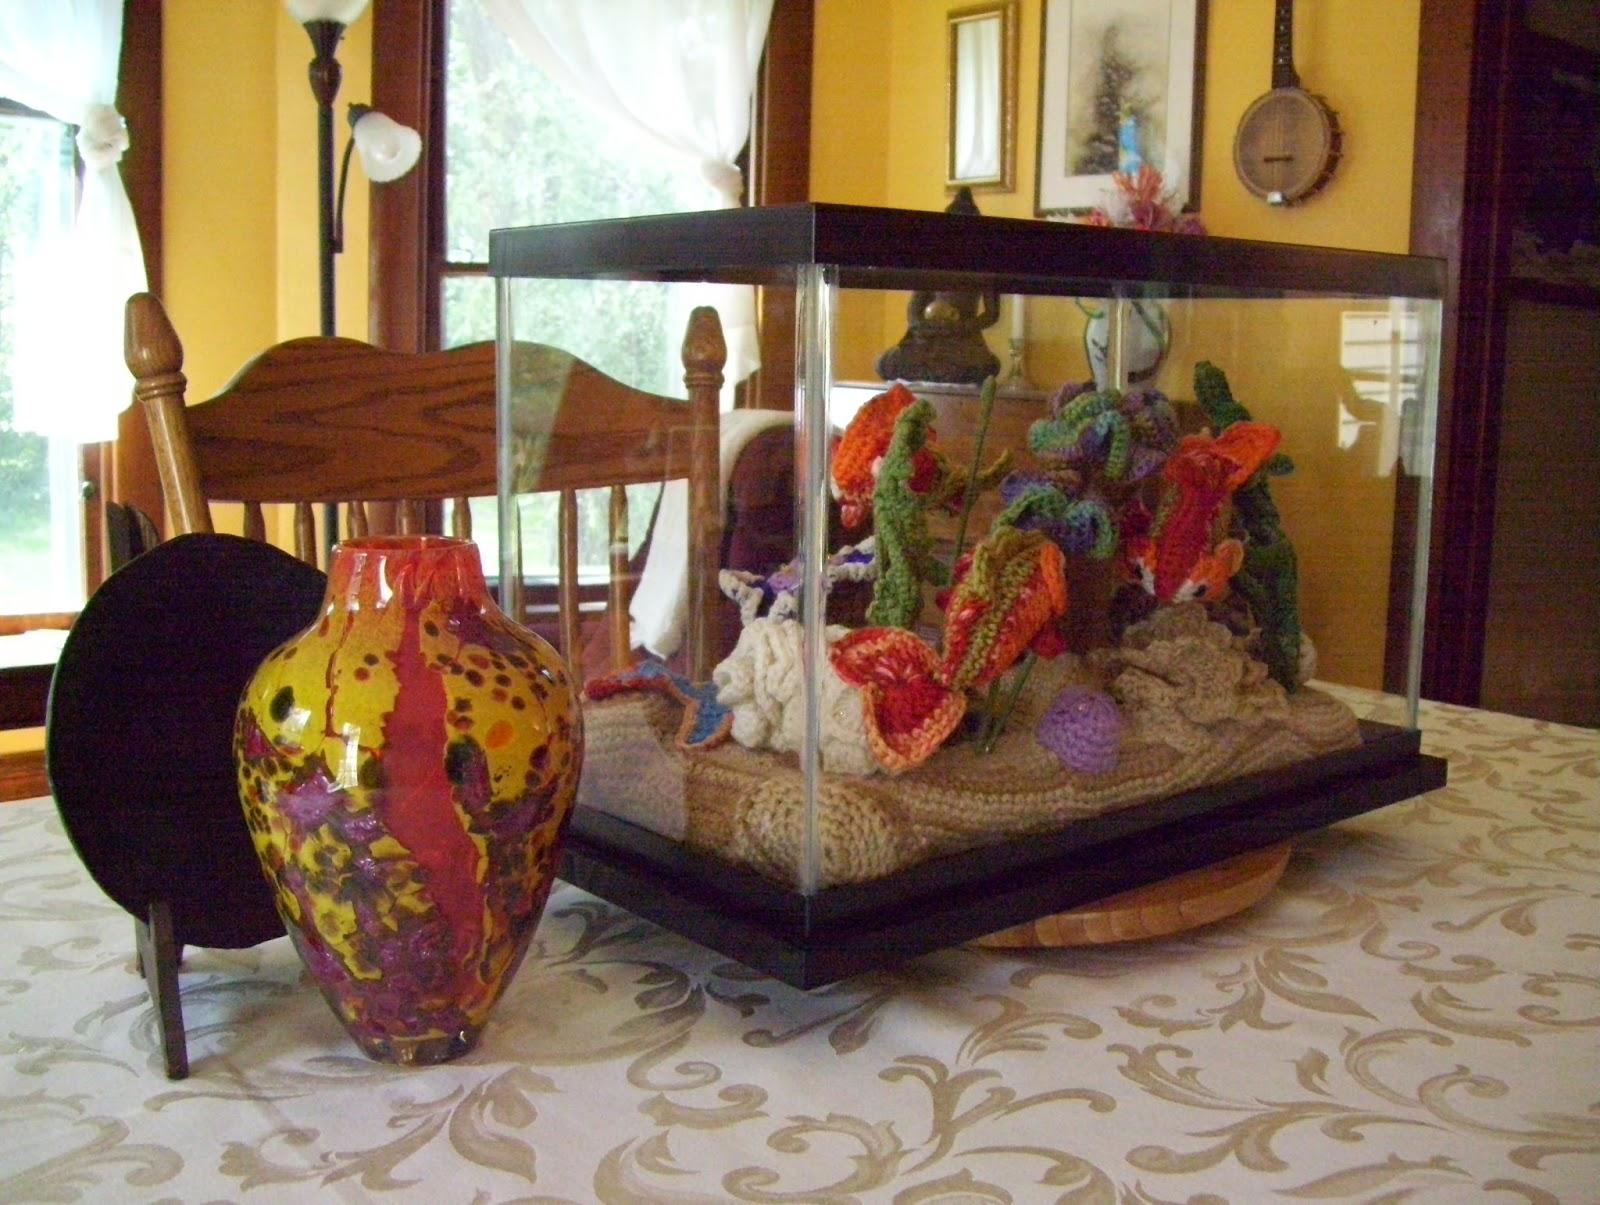 Studio 2137 crocheted fish tank for Jouet aquarium poisson